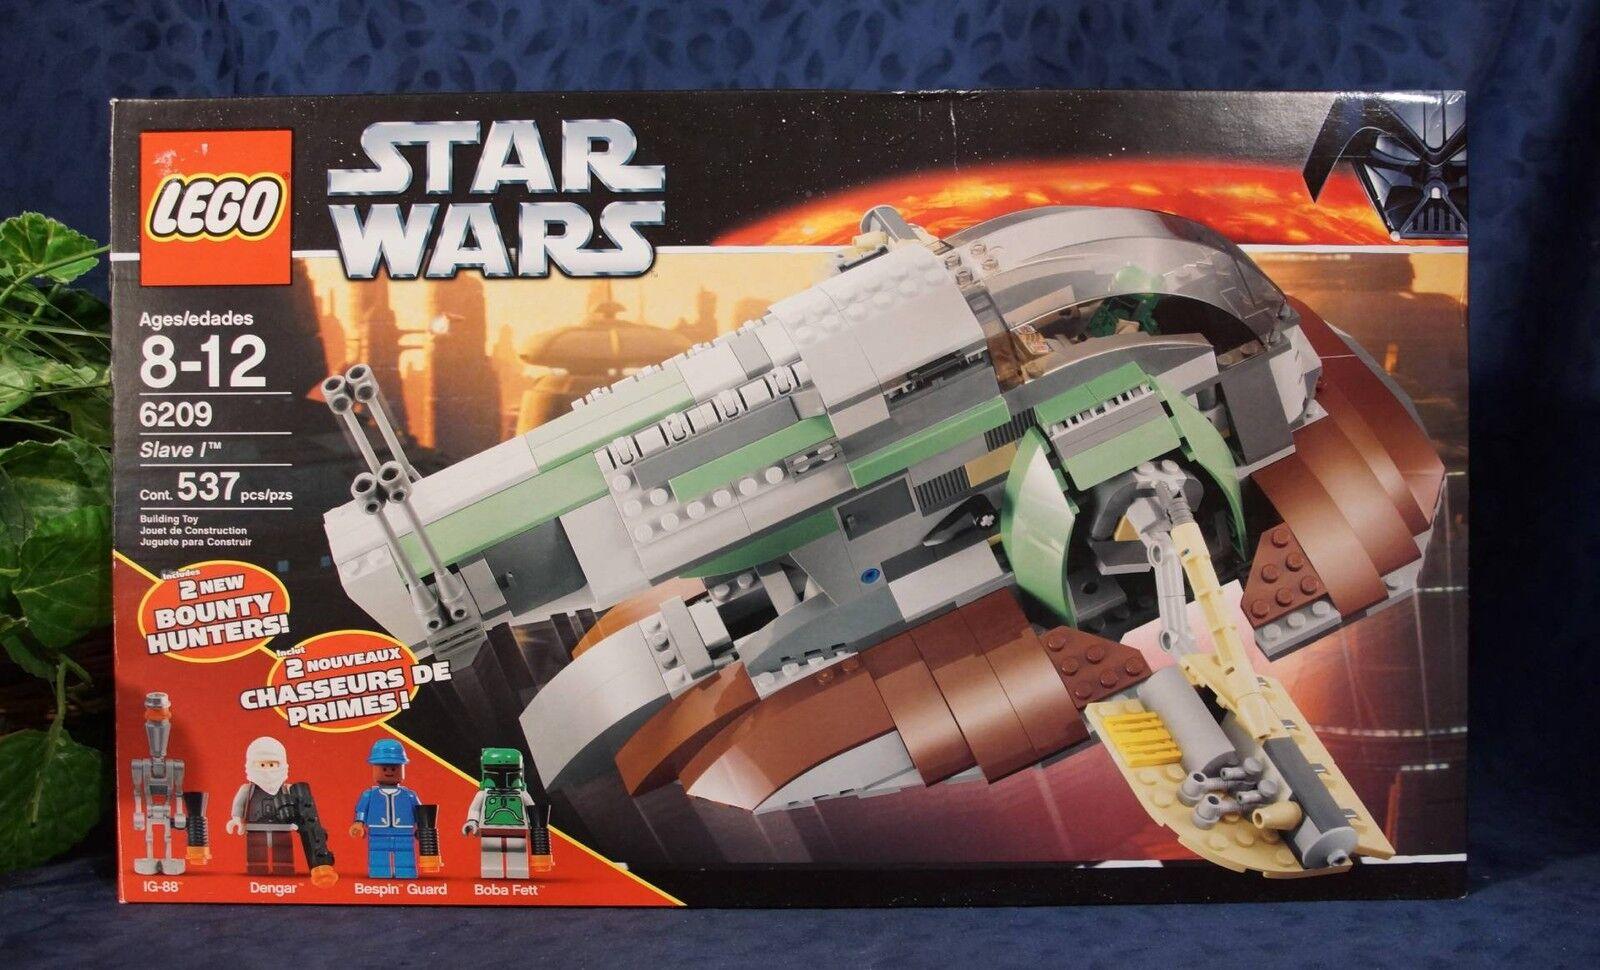 LEGO STAR WARS 6209 SLAVE I Kit